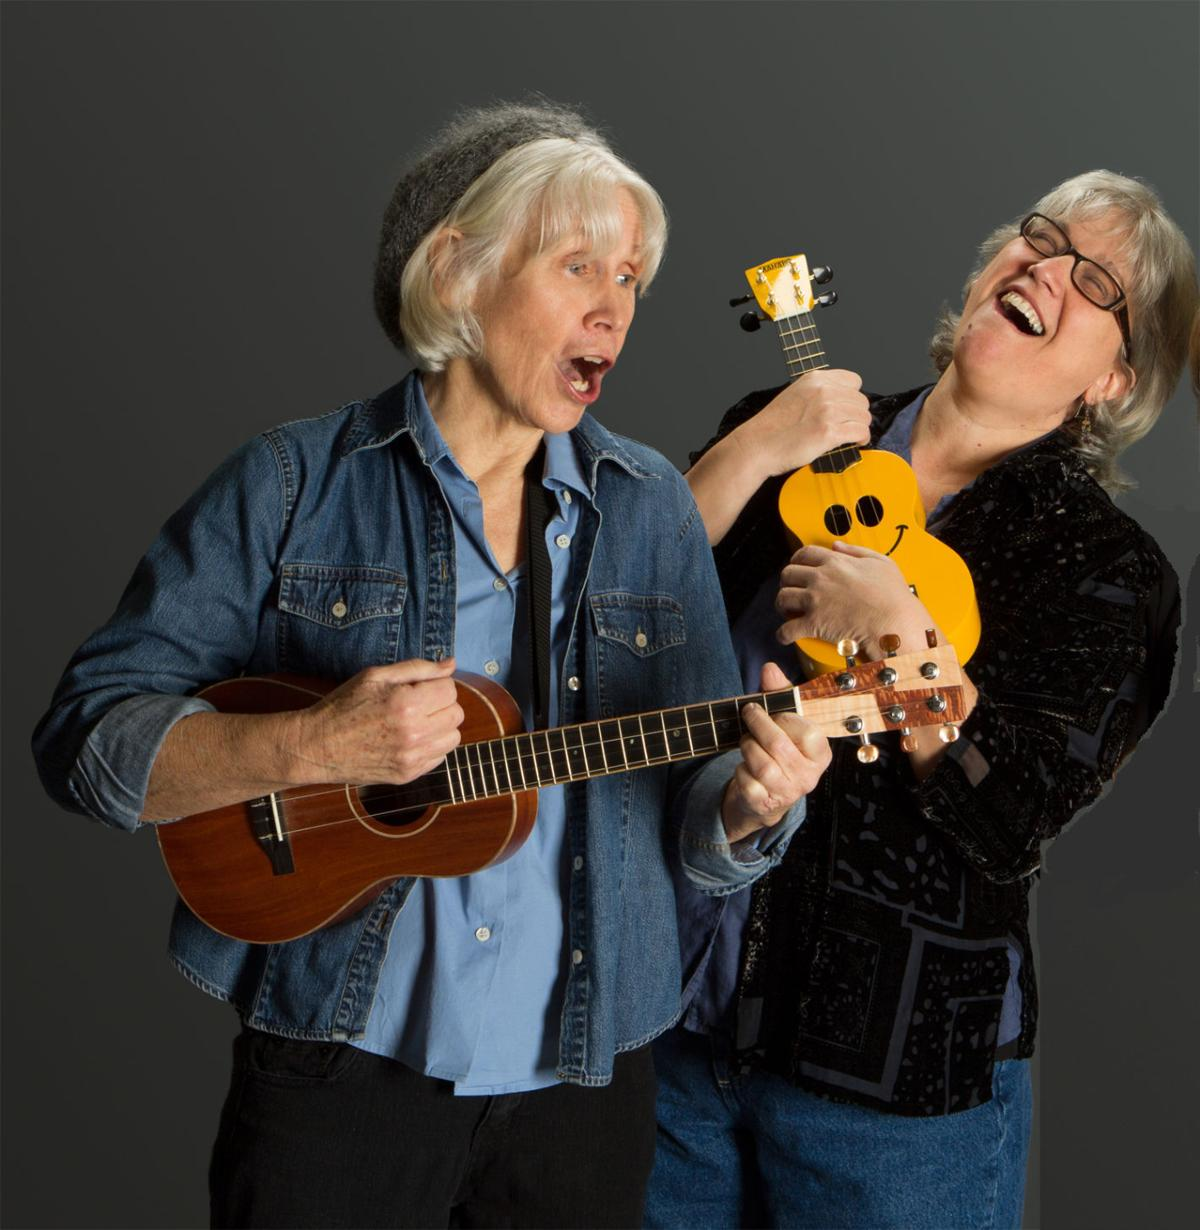 Jeanne Holmes and Suz Doyle